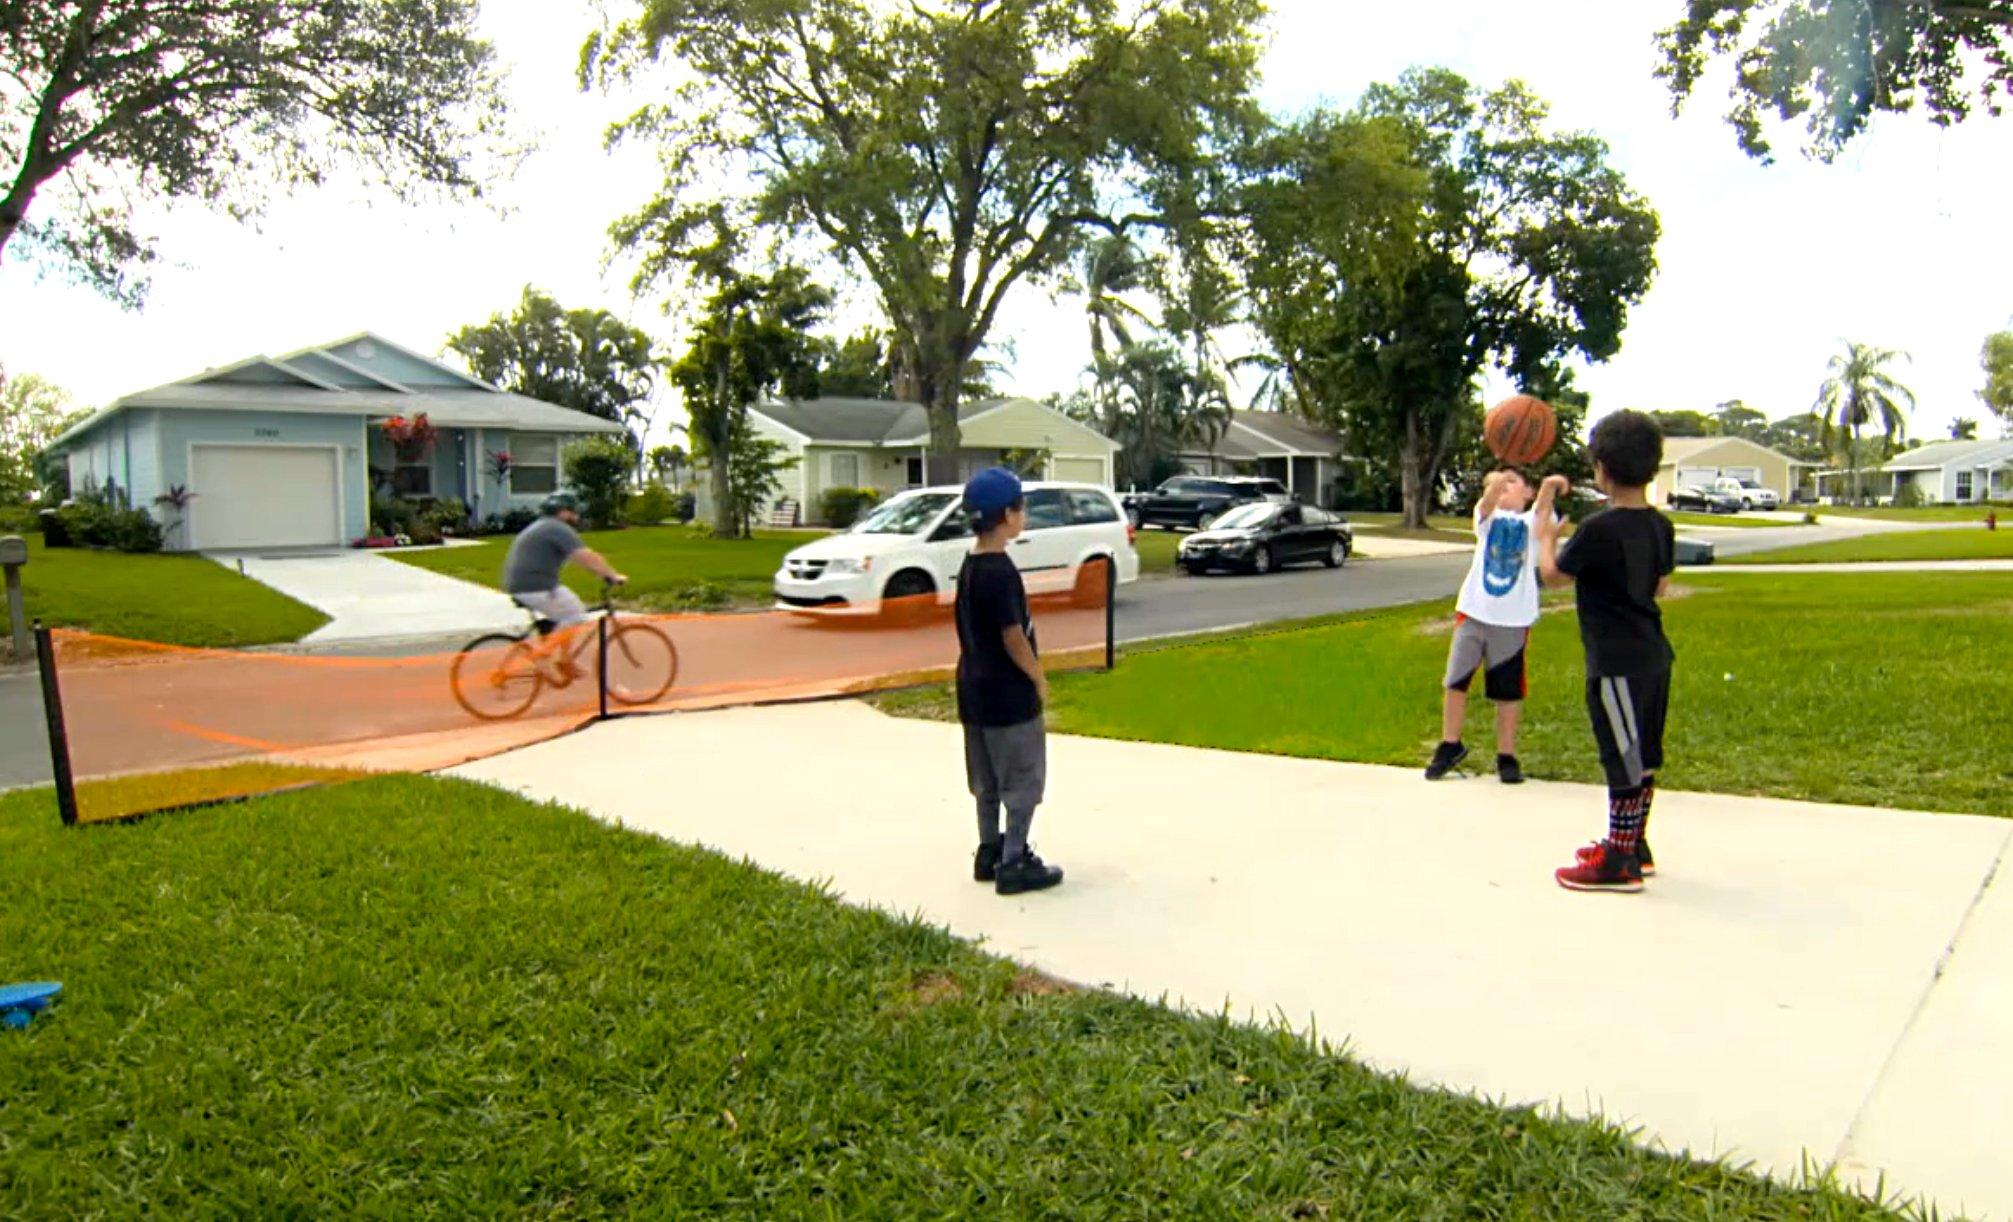 Play It Safe RPDN26 Driveway Net, Large, Orange by Play It Safe (Image #5)